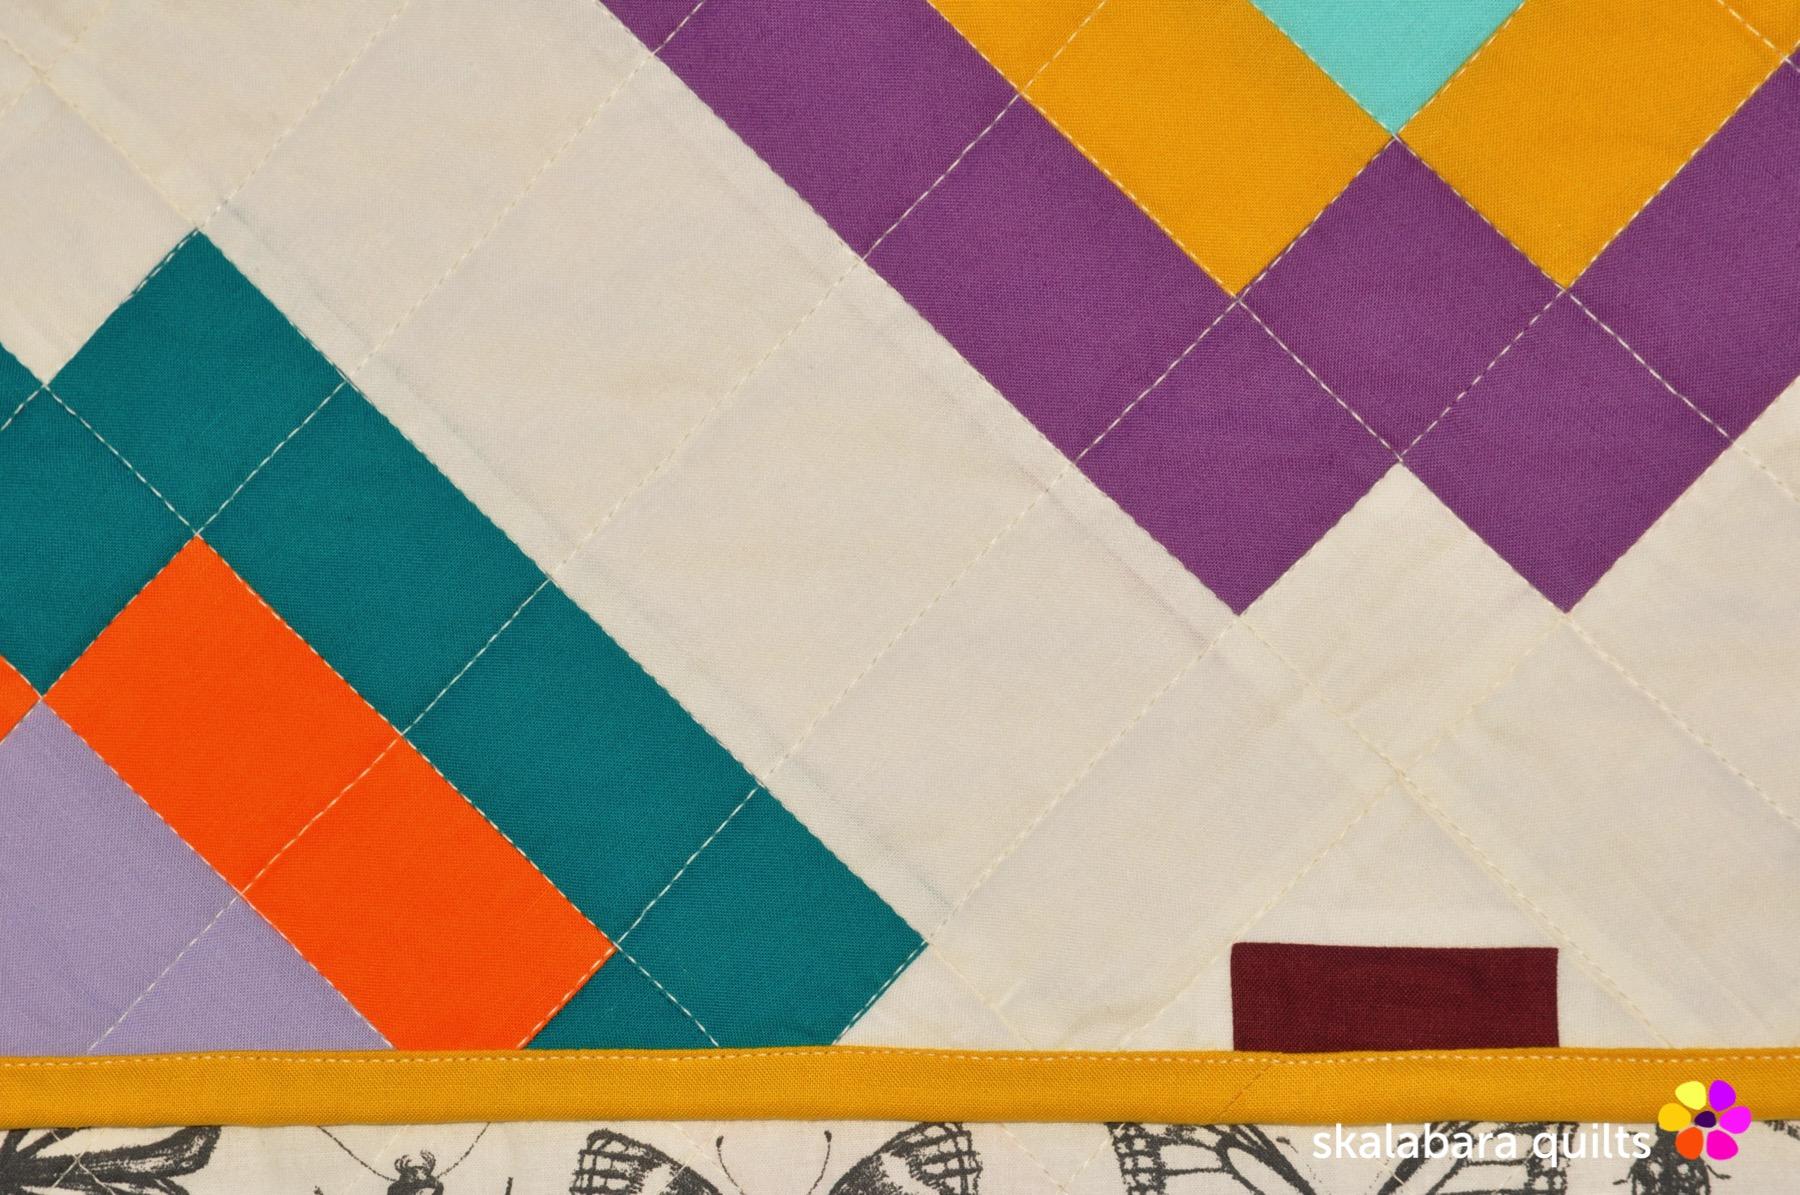 radiate quilt detail 5 - skalabara quilts